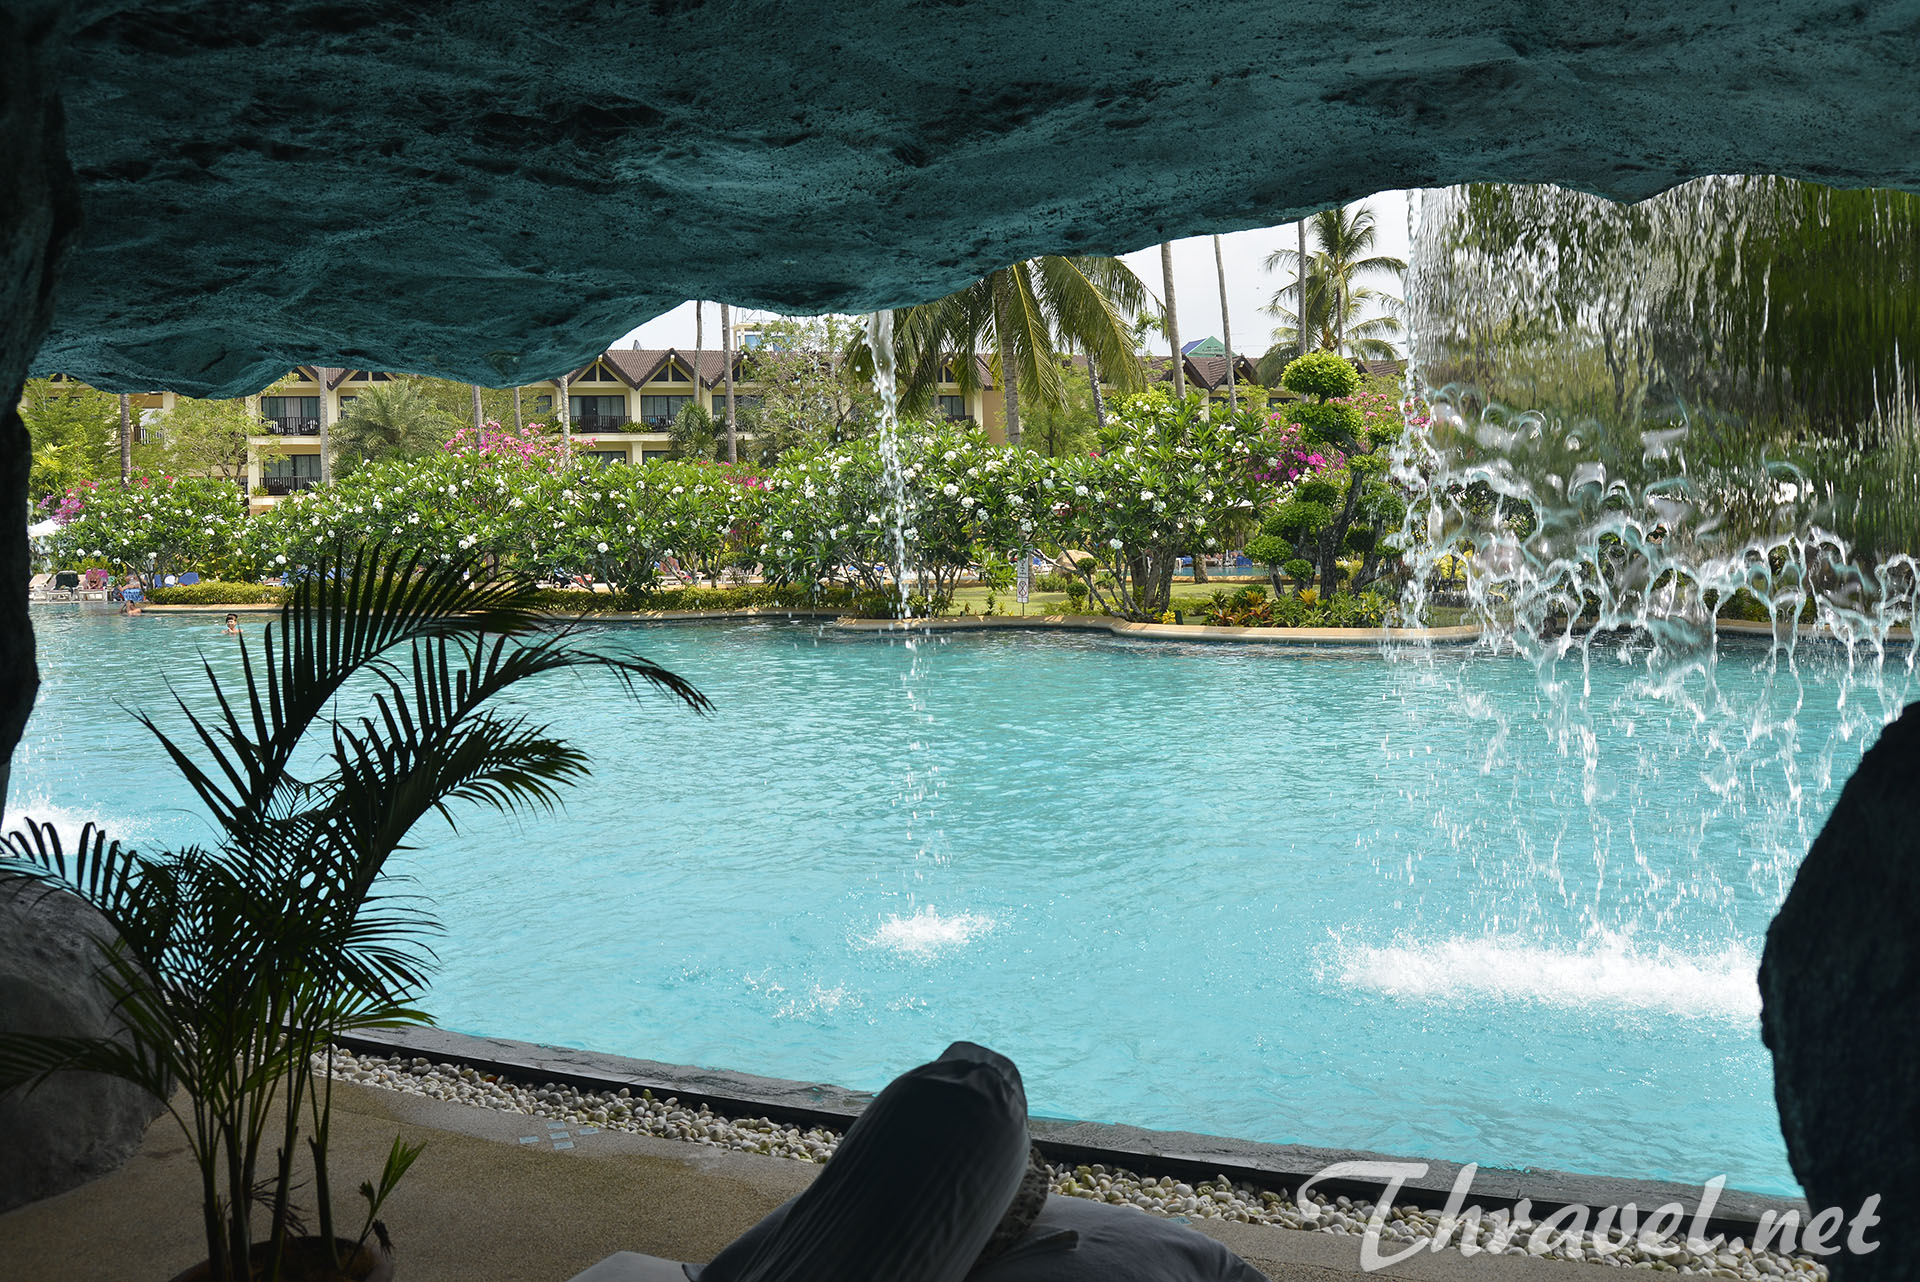 duangjitt-resort-and-spa-hotel-patong-beach-phuket-thailand-32